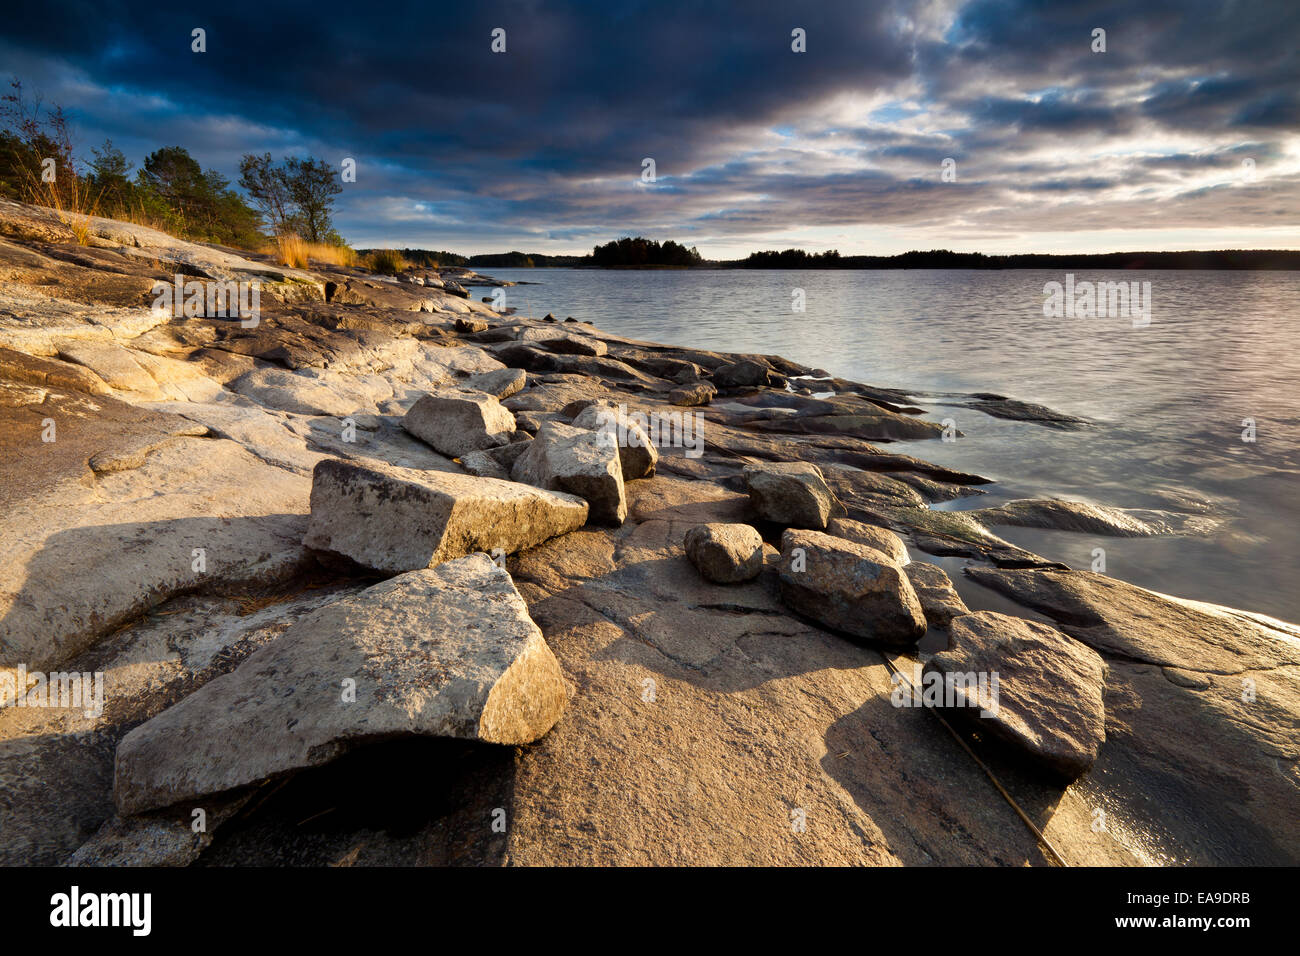 Felsen am See auf der Insel Brattholmen in den See Vansjø, Råde Kommune, Østfold Fylke, Norwegen. Stockbild